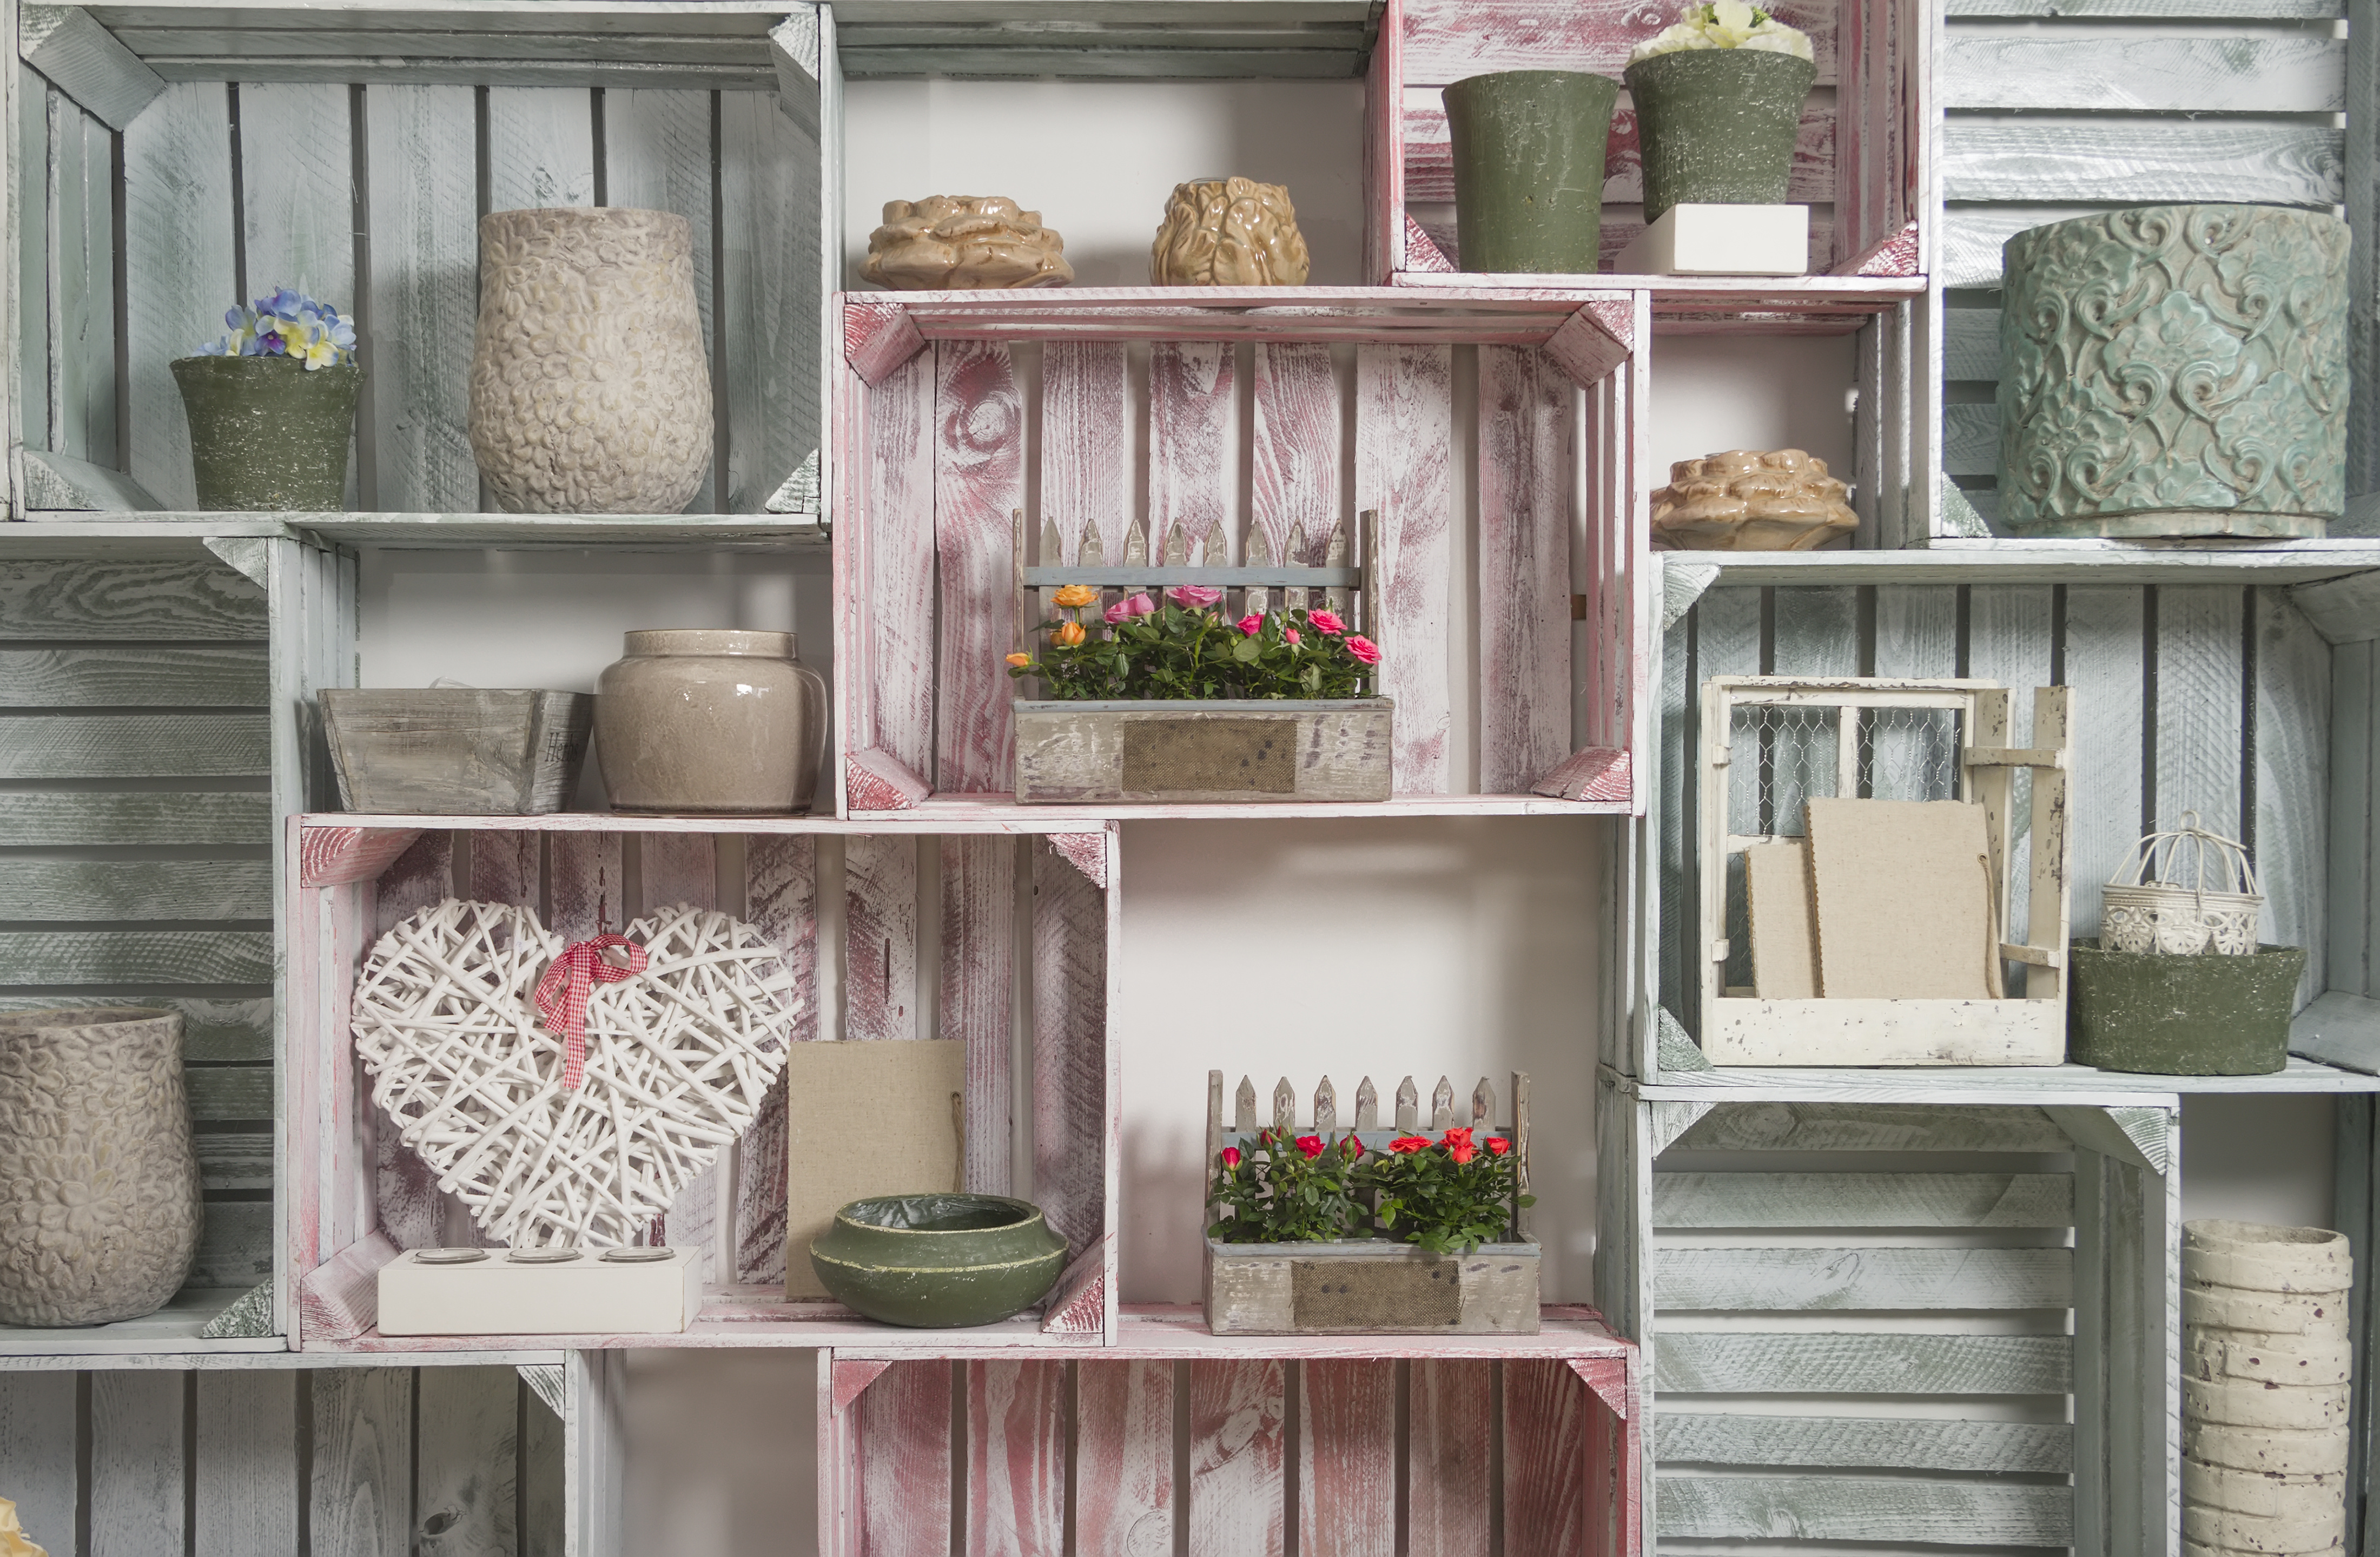 The Crafty Kitty | Playdough Bakery